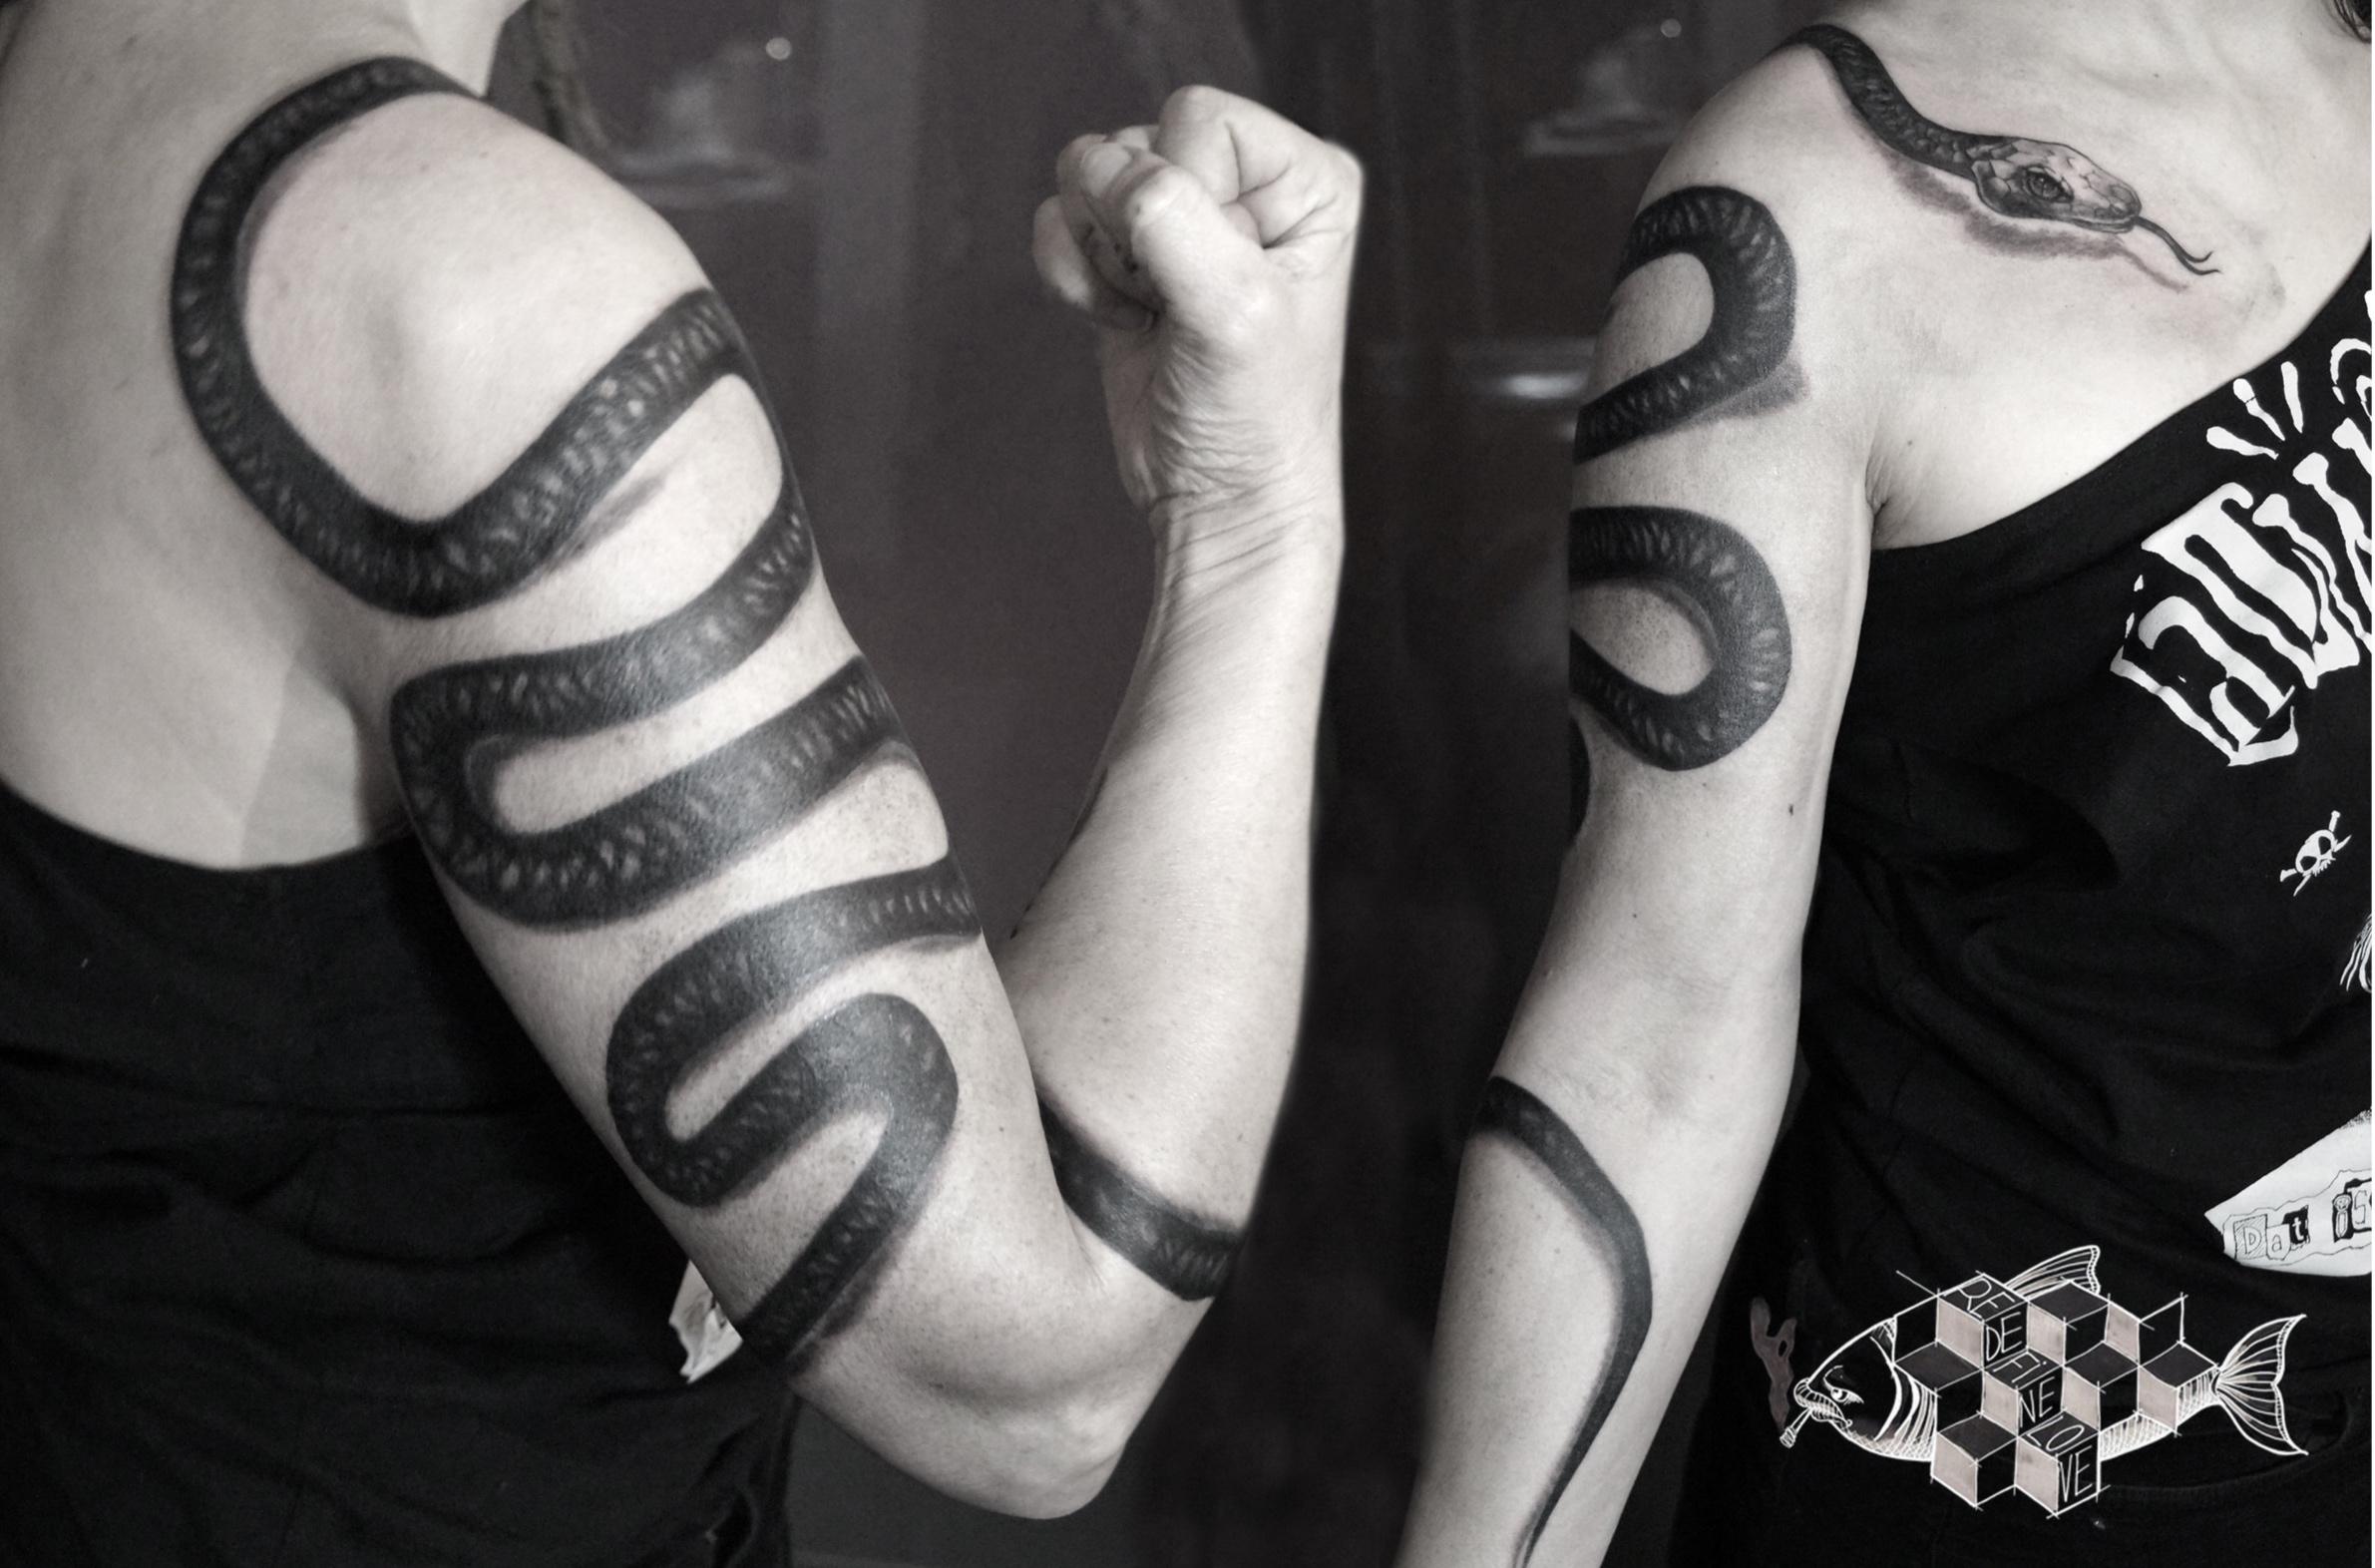 fioniverse-gil-snake-tattoo.jpg